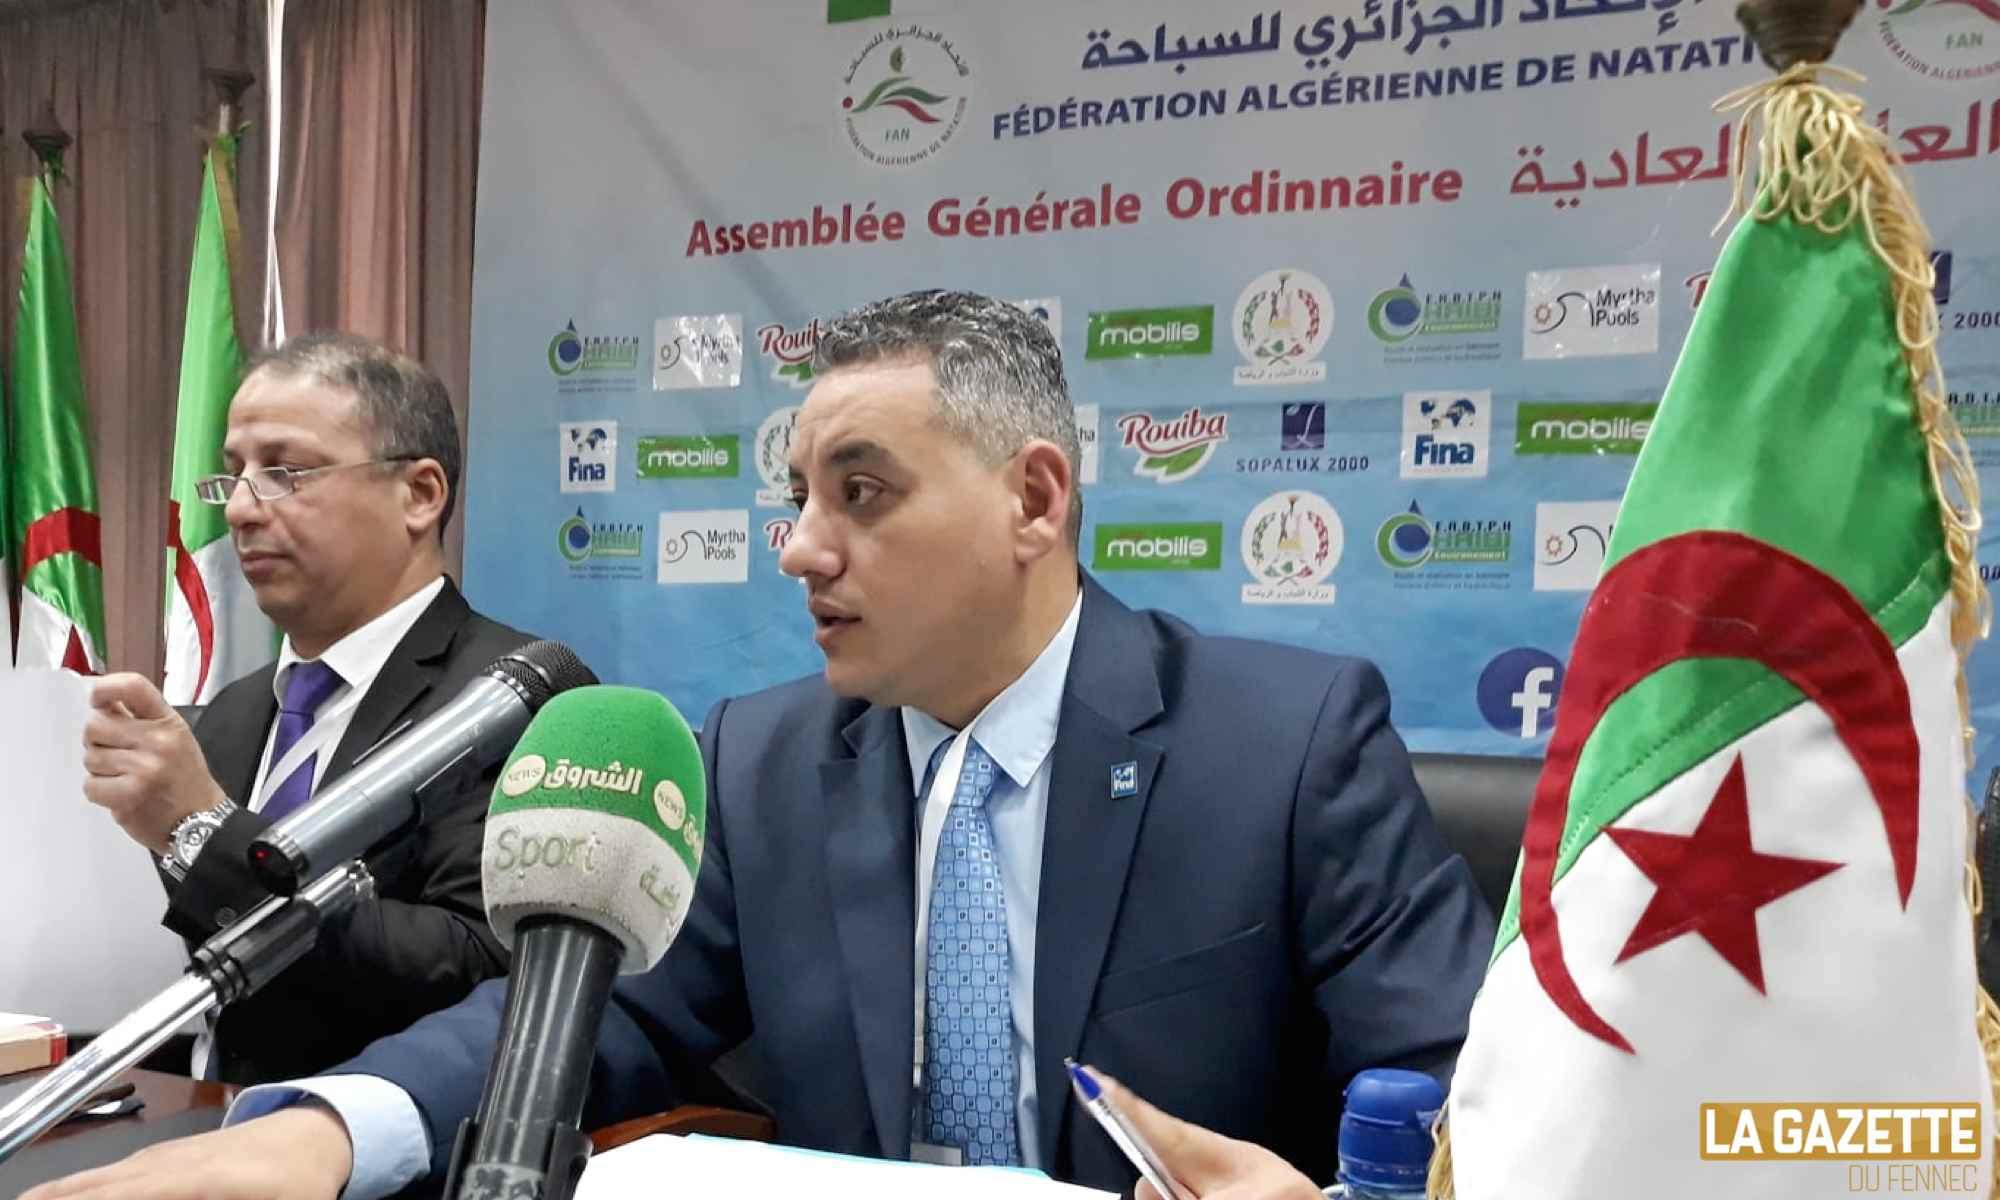 boughadou candidat unique natation fan reelu